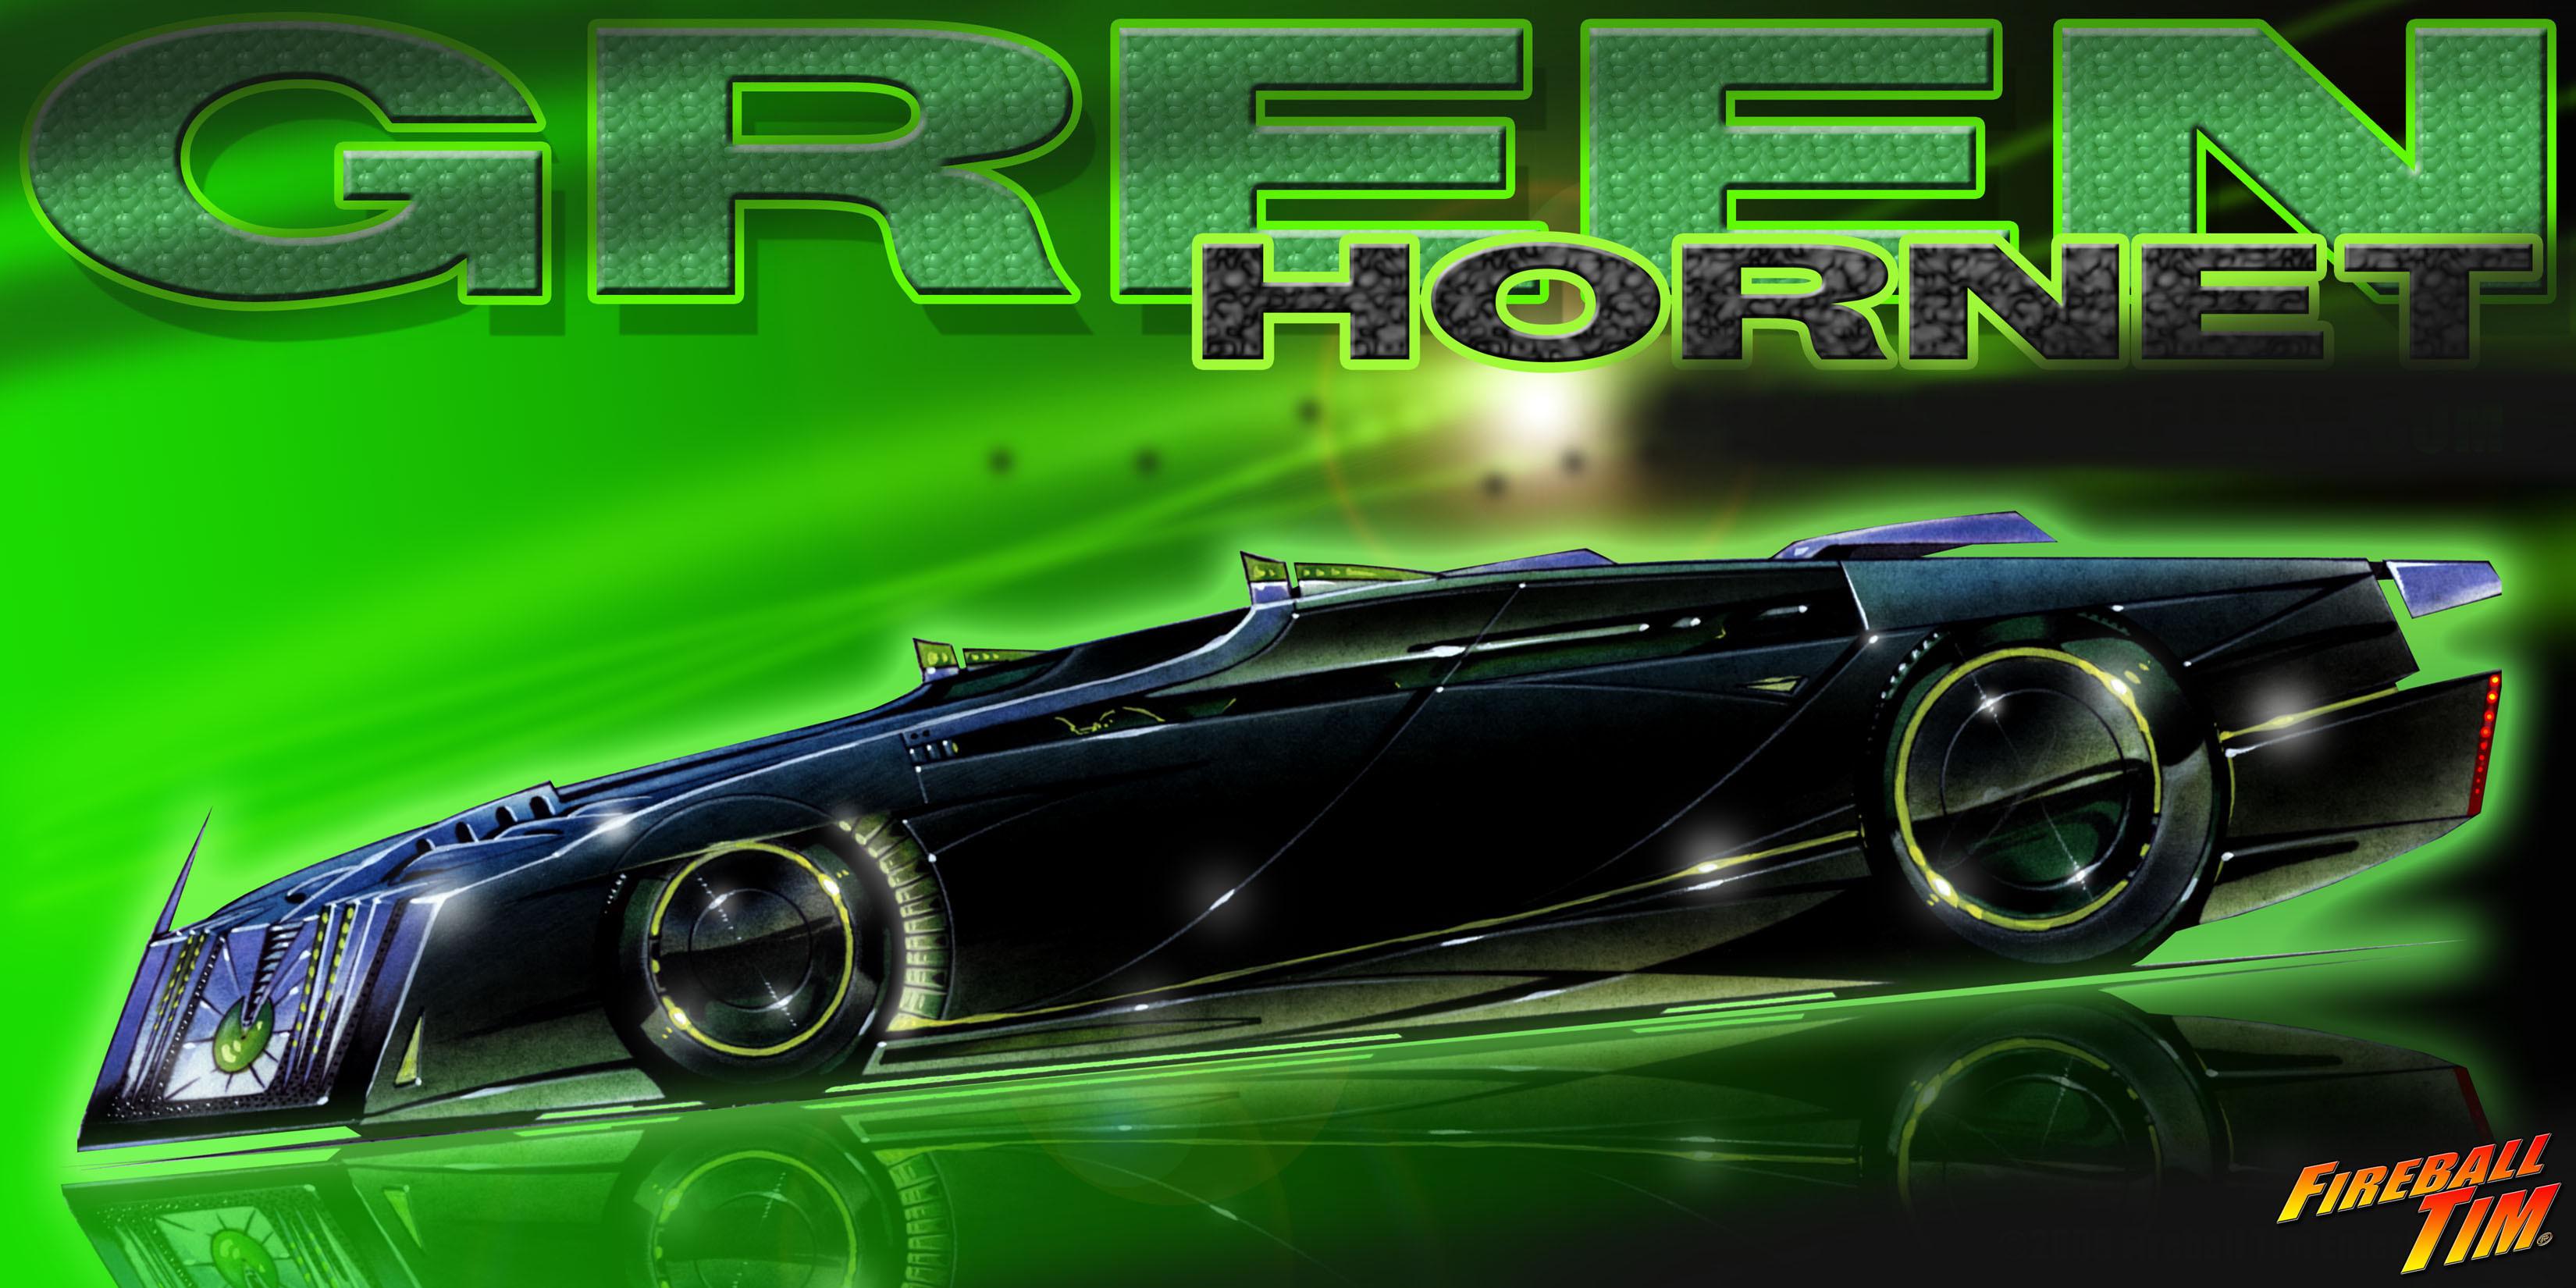 Early GREEN HORNET BLACK BEAUTY CONCEPT